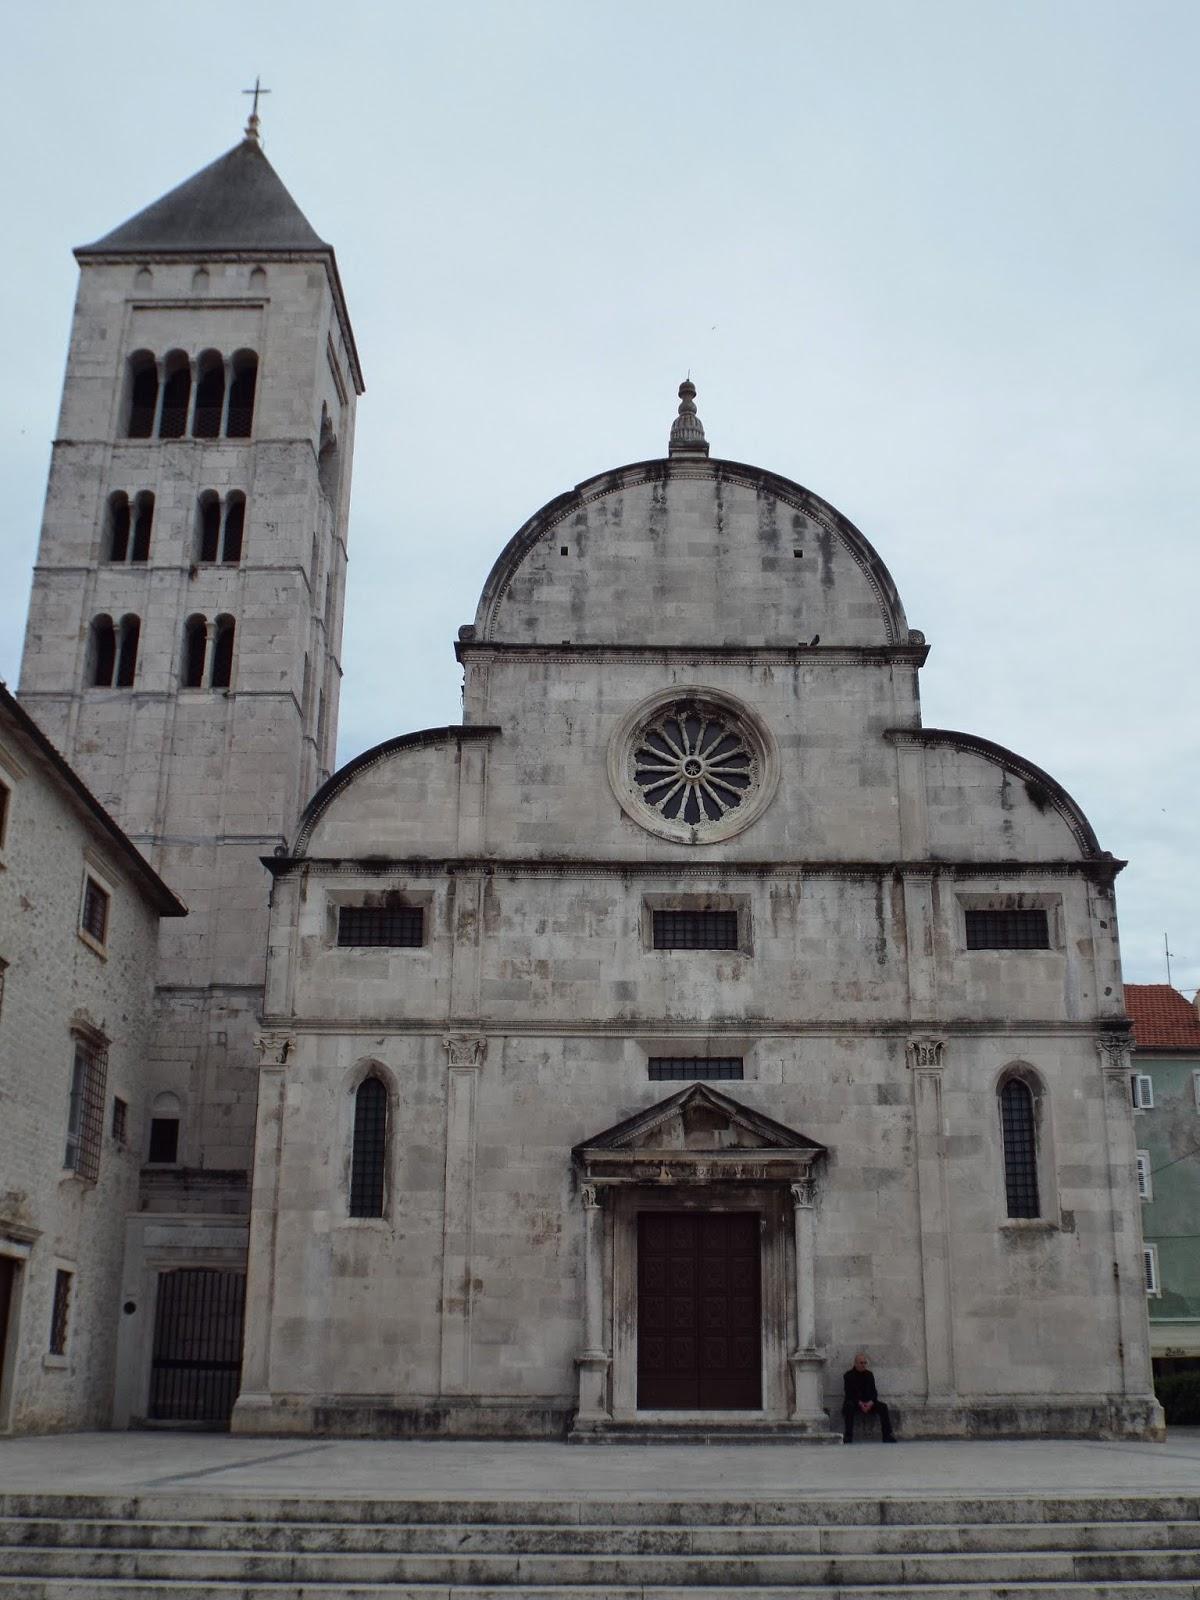 St Mary's Benedictine Church, Zadar, Croatia - photo by Katie @ Second-Hand Hedgehog travel blog